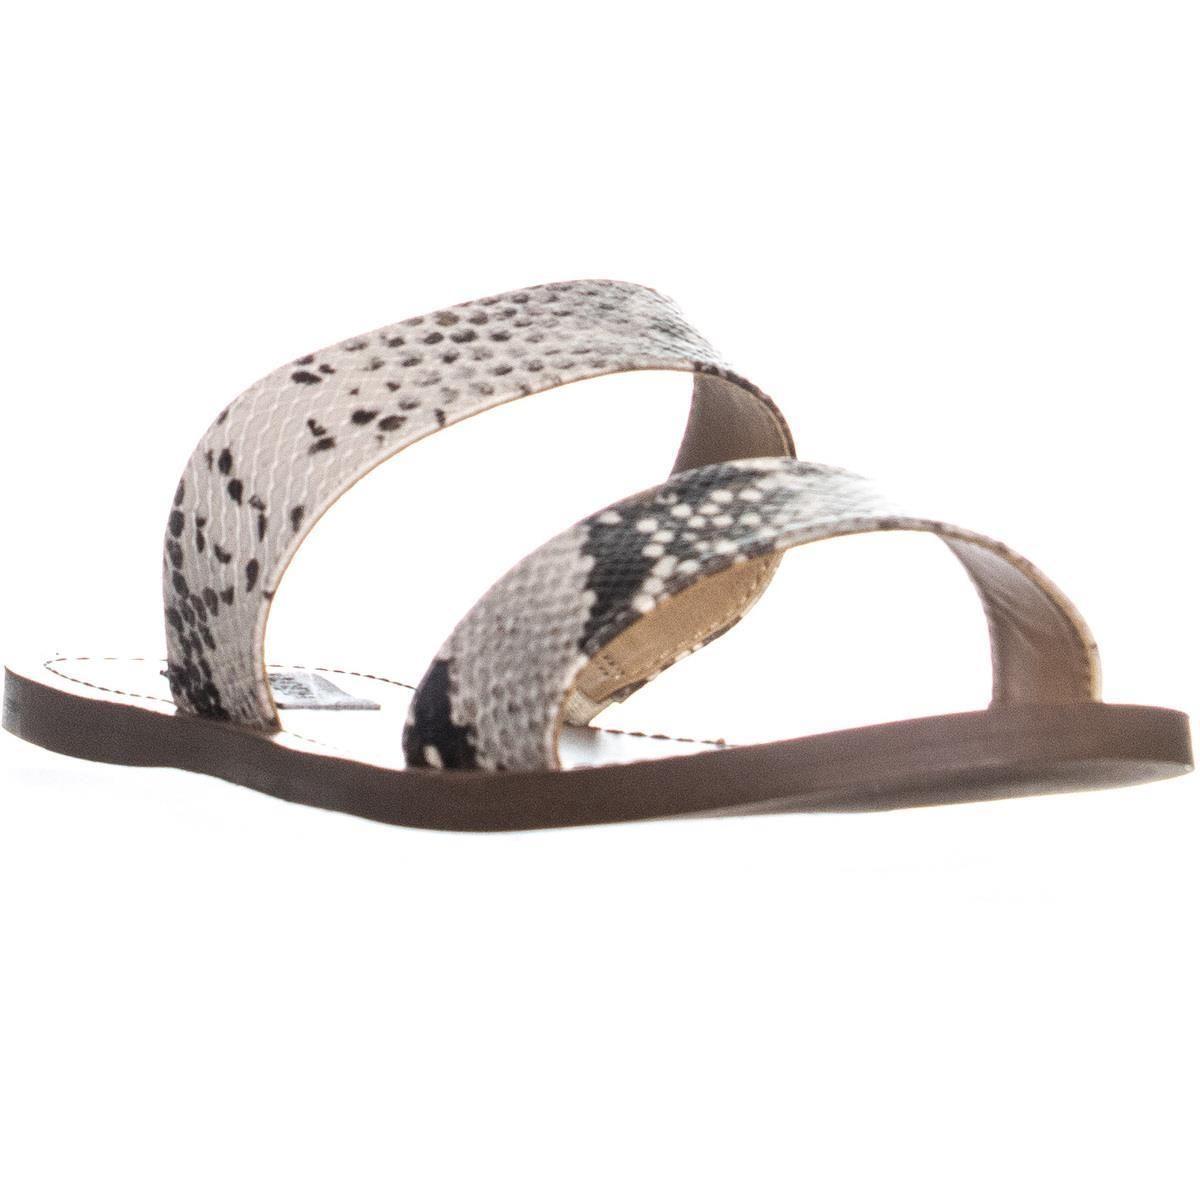 165b8946601 Steve Madden Rage Double Strap Slide Sandals in Natural - Lyst